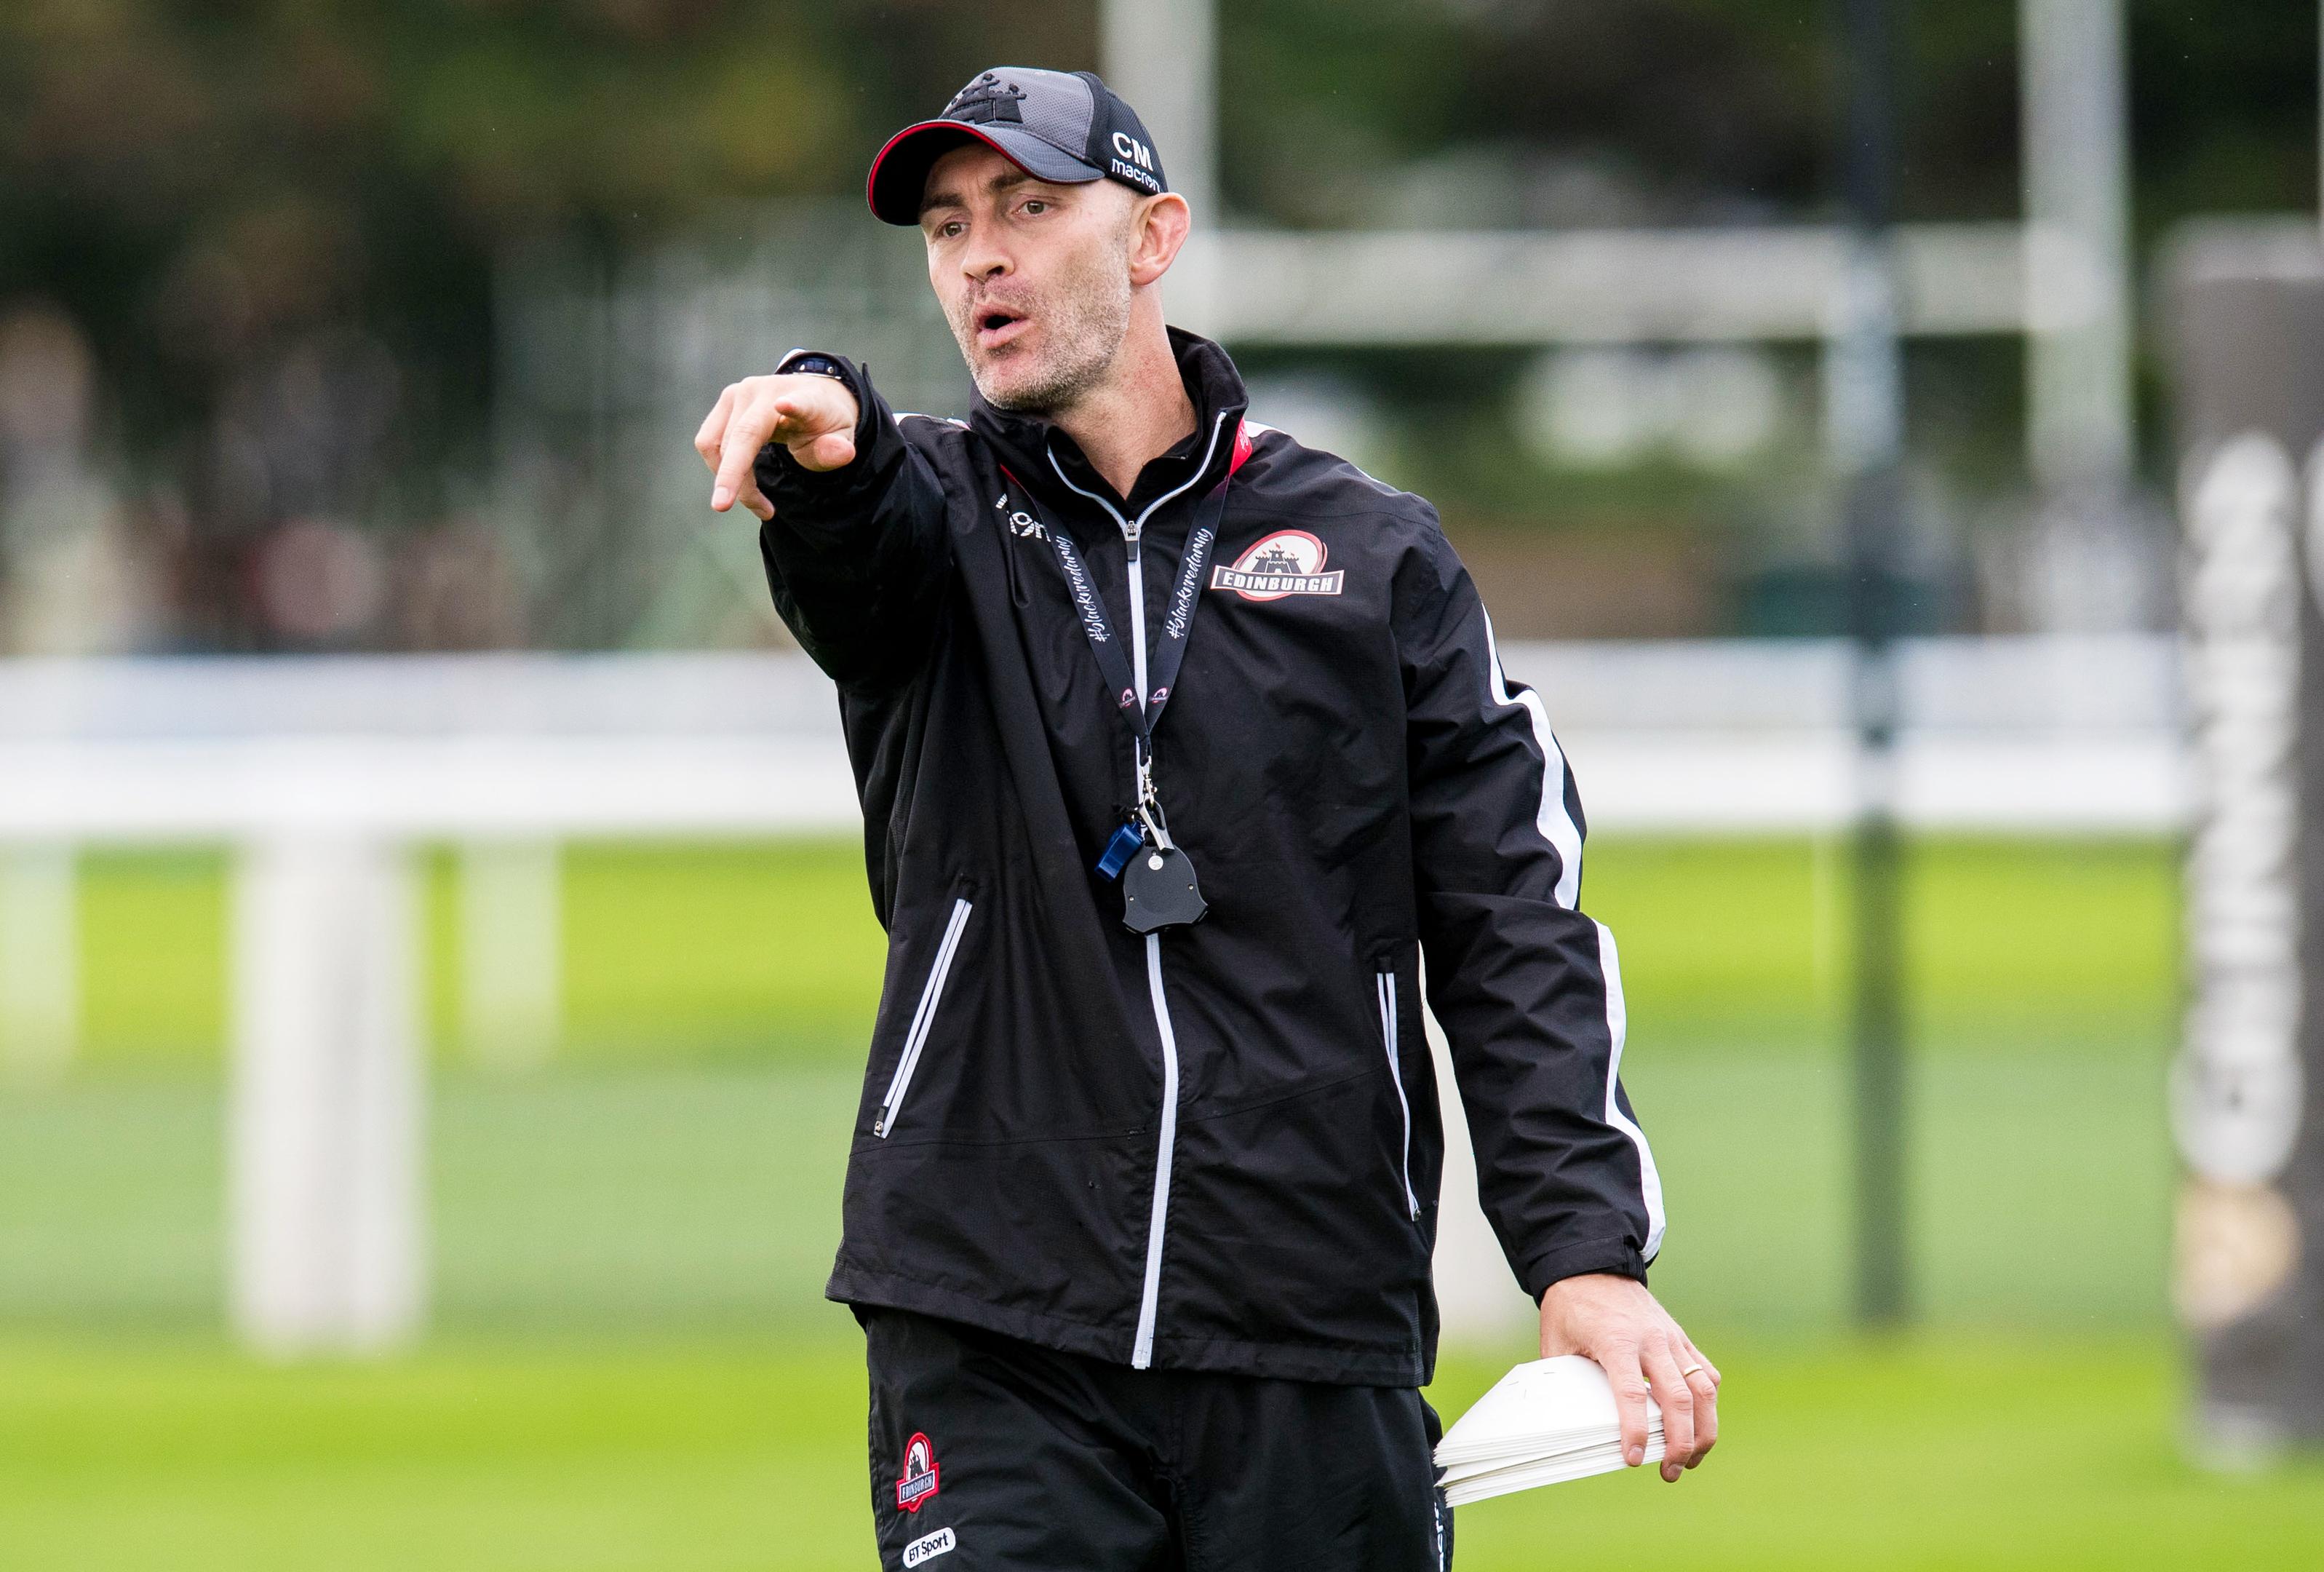 Edinburgh defence coach Calum MacRae has swiftly improved one of the club's problem areas.